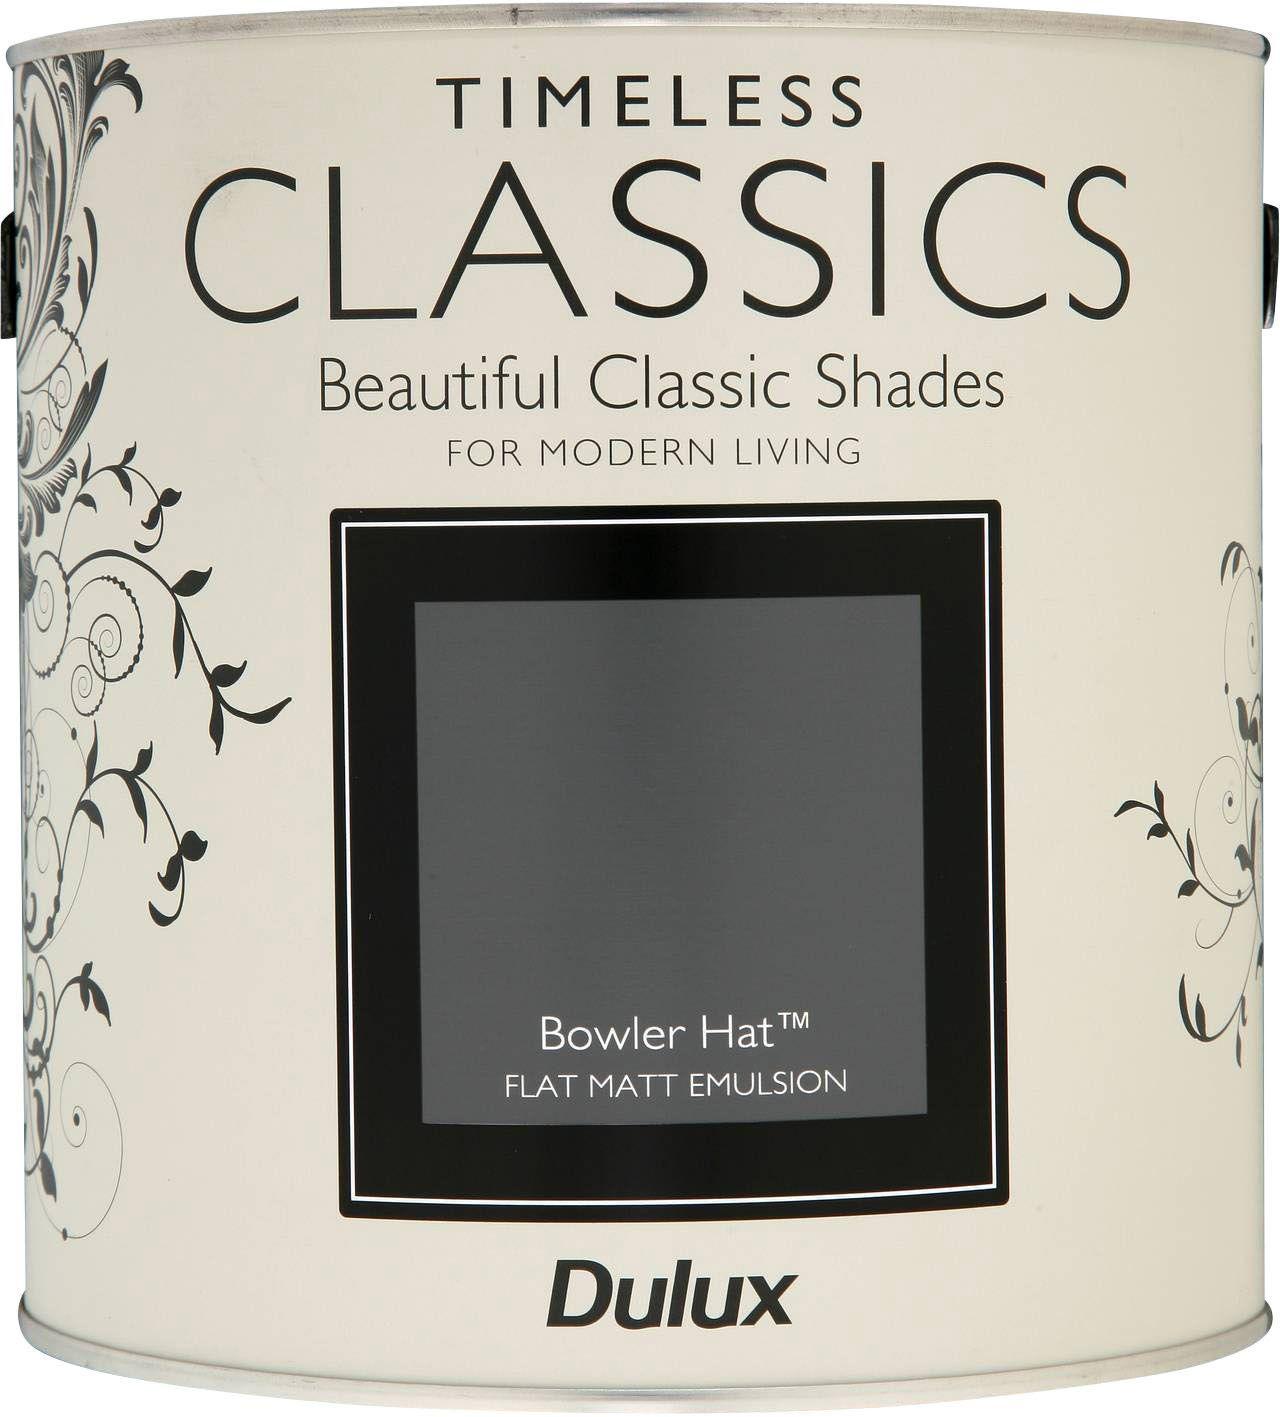 761e400819fc2 Dulux Timeless Classics Bowler Hat Matt Emulsion Paint 2.5L ...